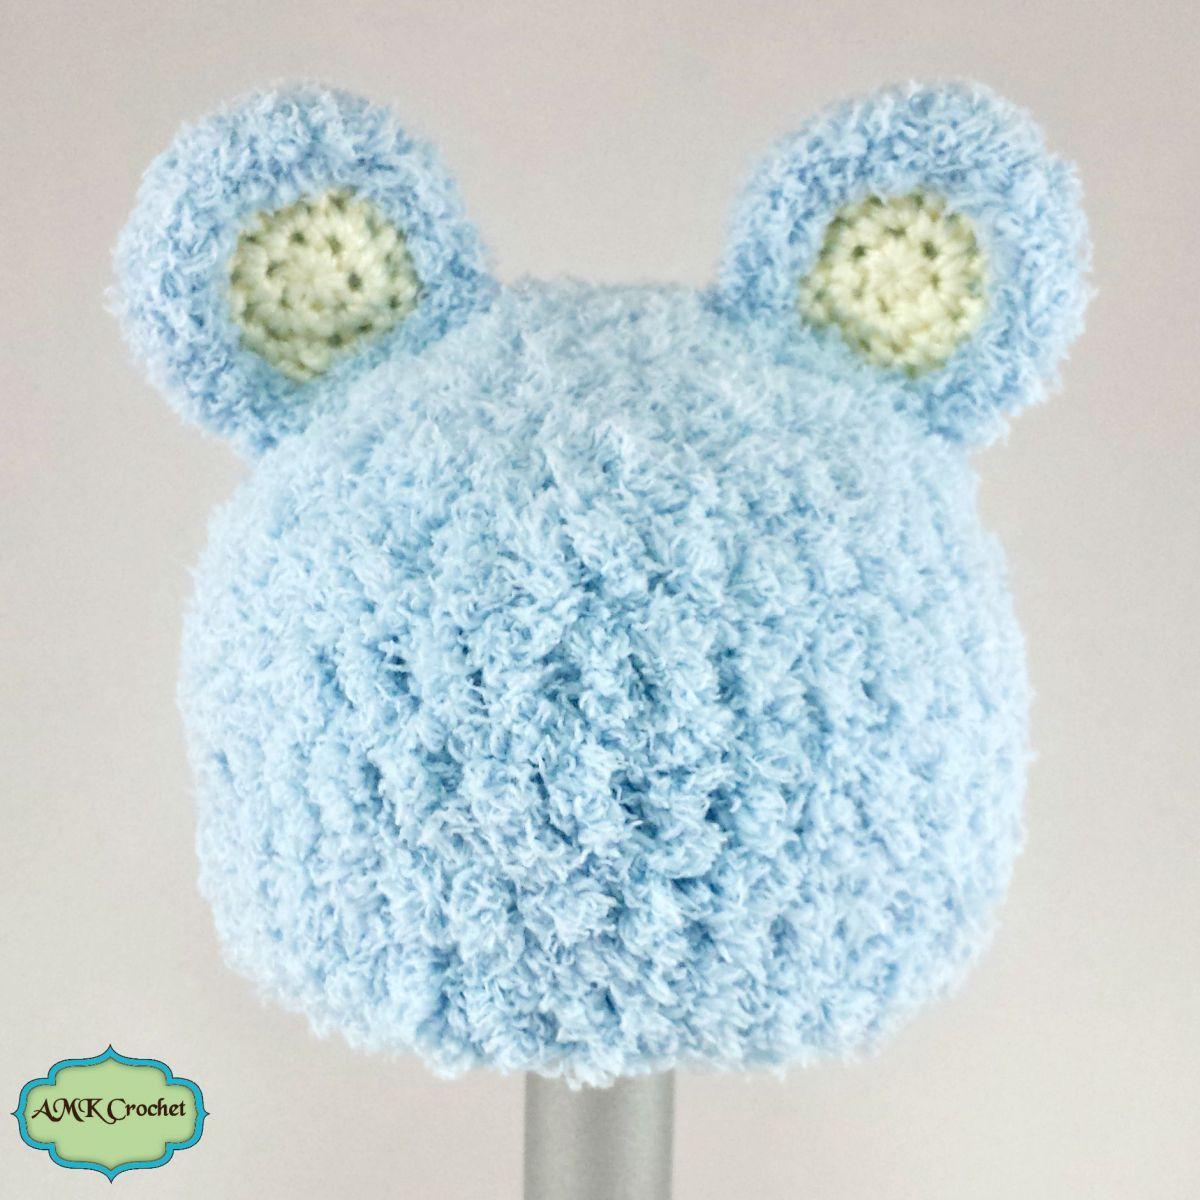 Bernat Pipsqueak yarn is a super soft, bulky weight (size 5) yarn ...